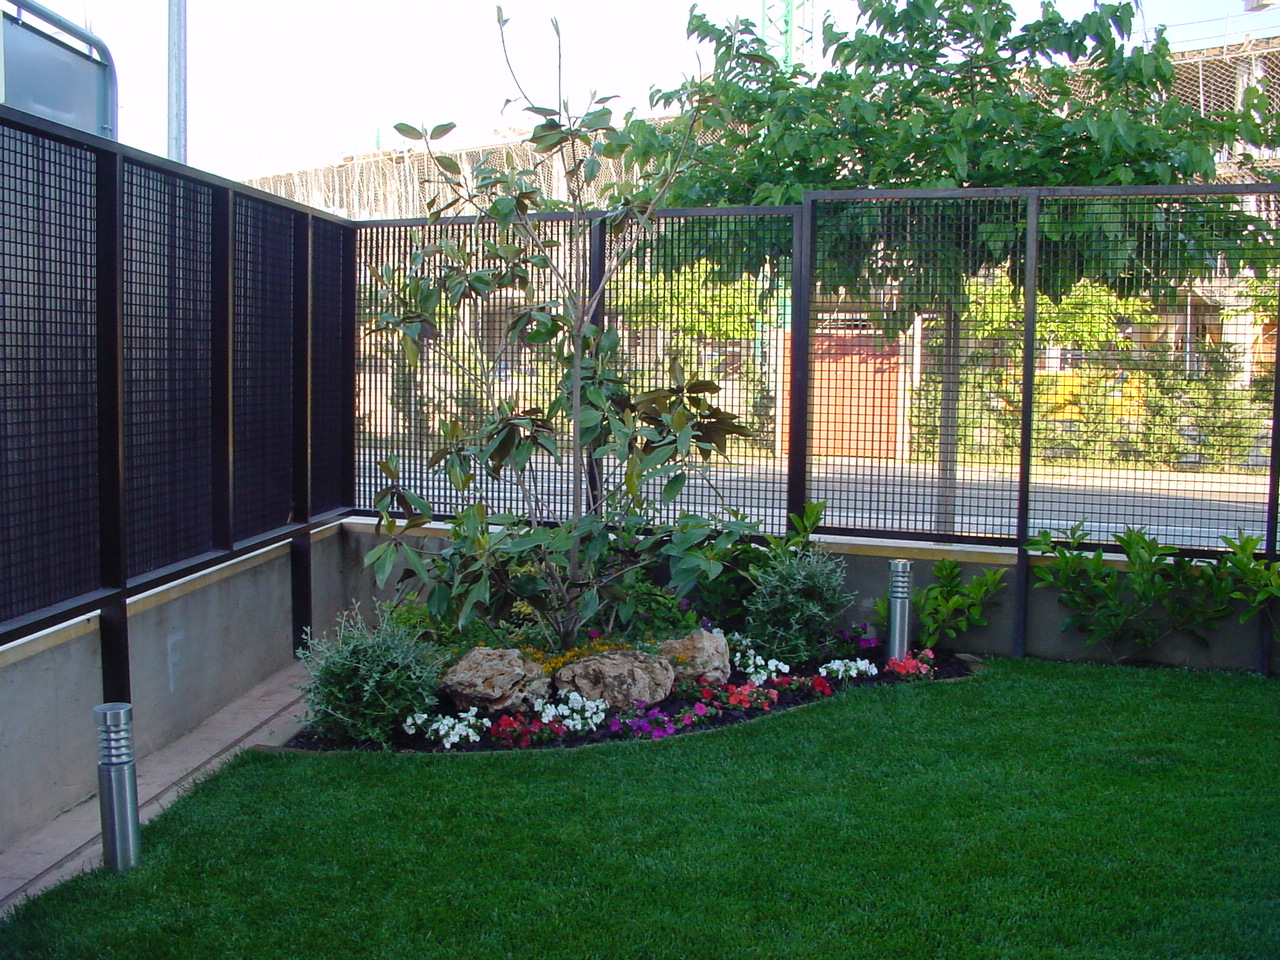 Jardineria eladio nonay jardiner a eladio nonay for Iluminacion arboles jardin